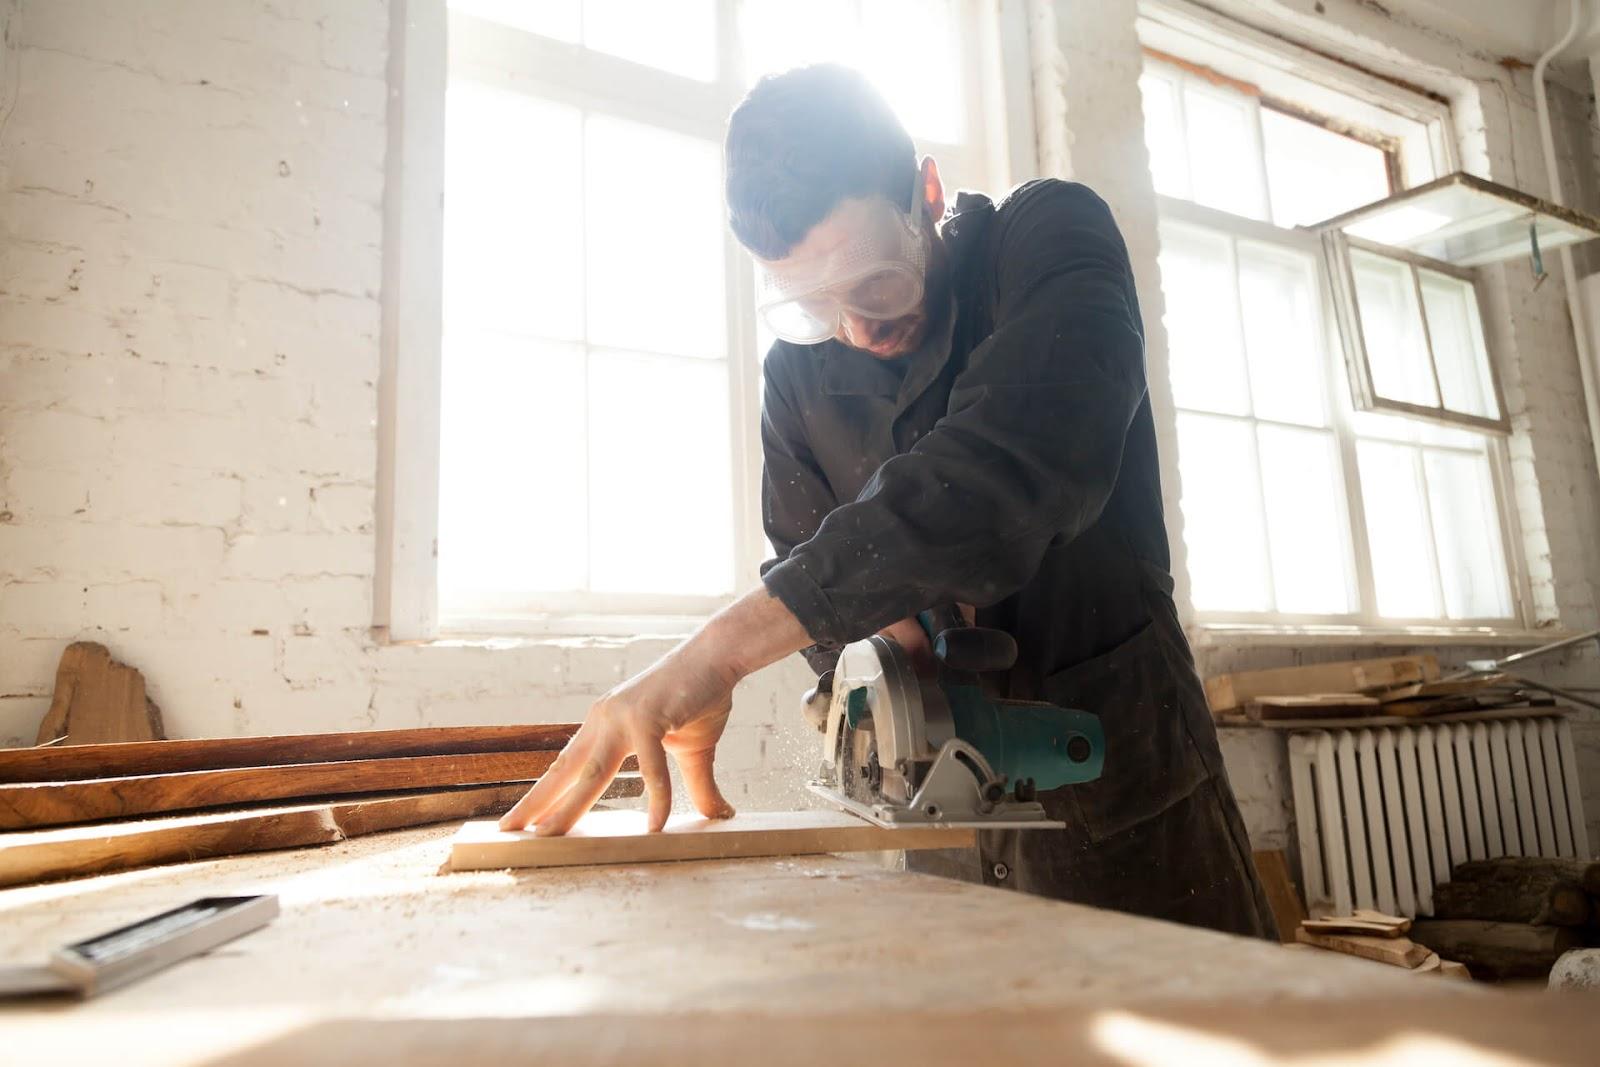 Man cutting cabinets